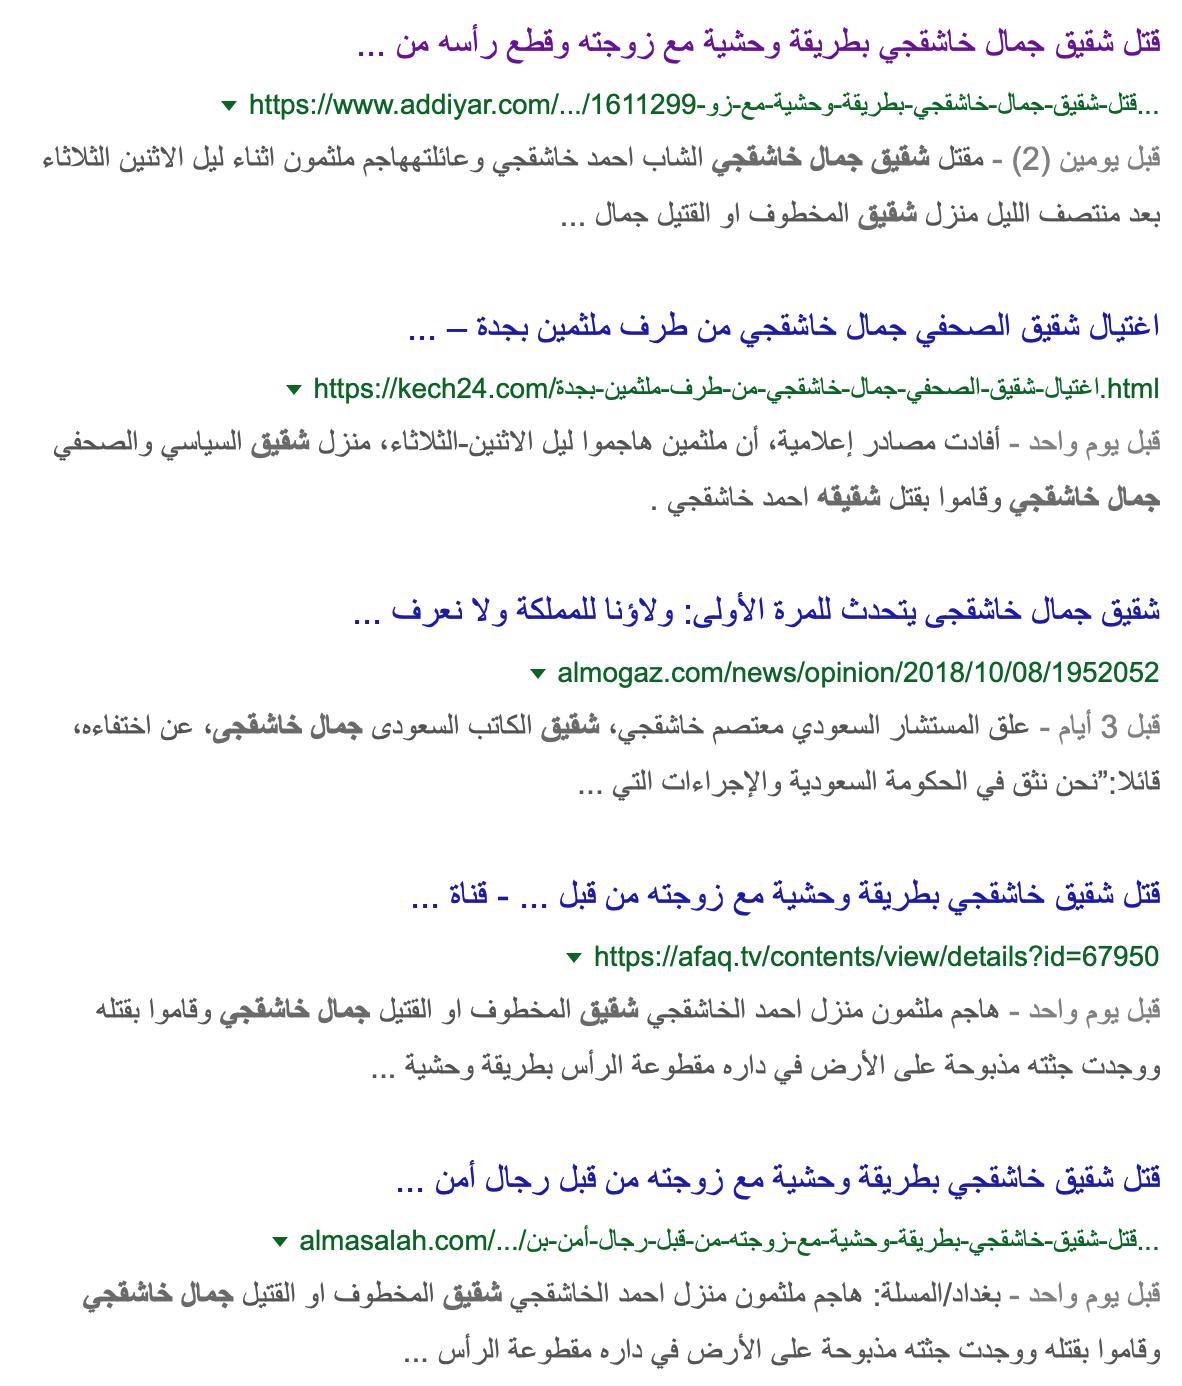 Verify-sy | News claiming Jamal Khashoggi's brother and his